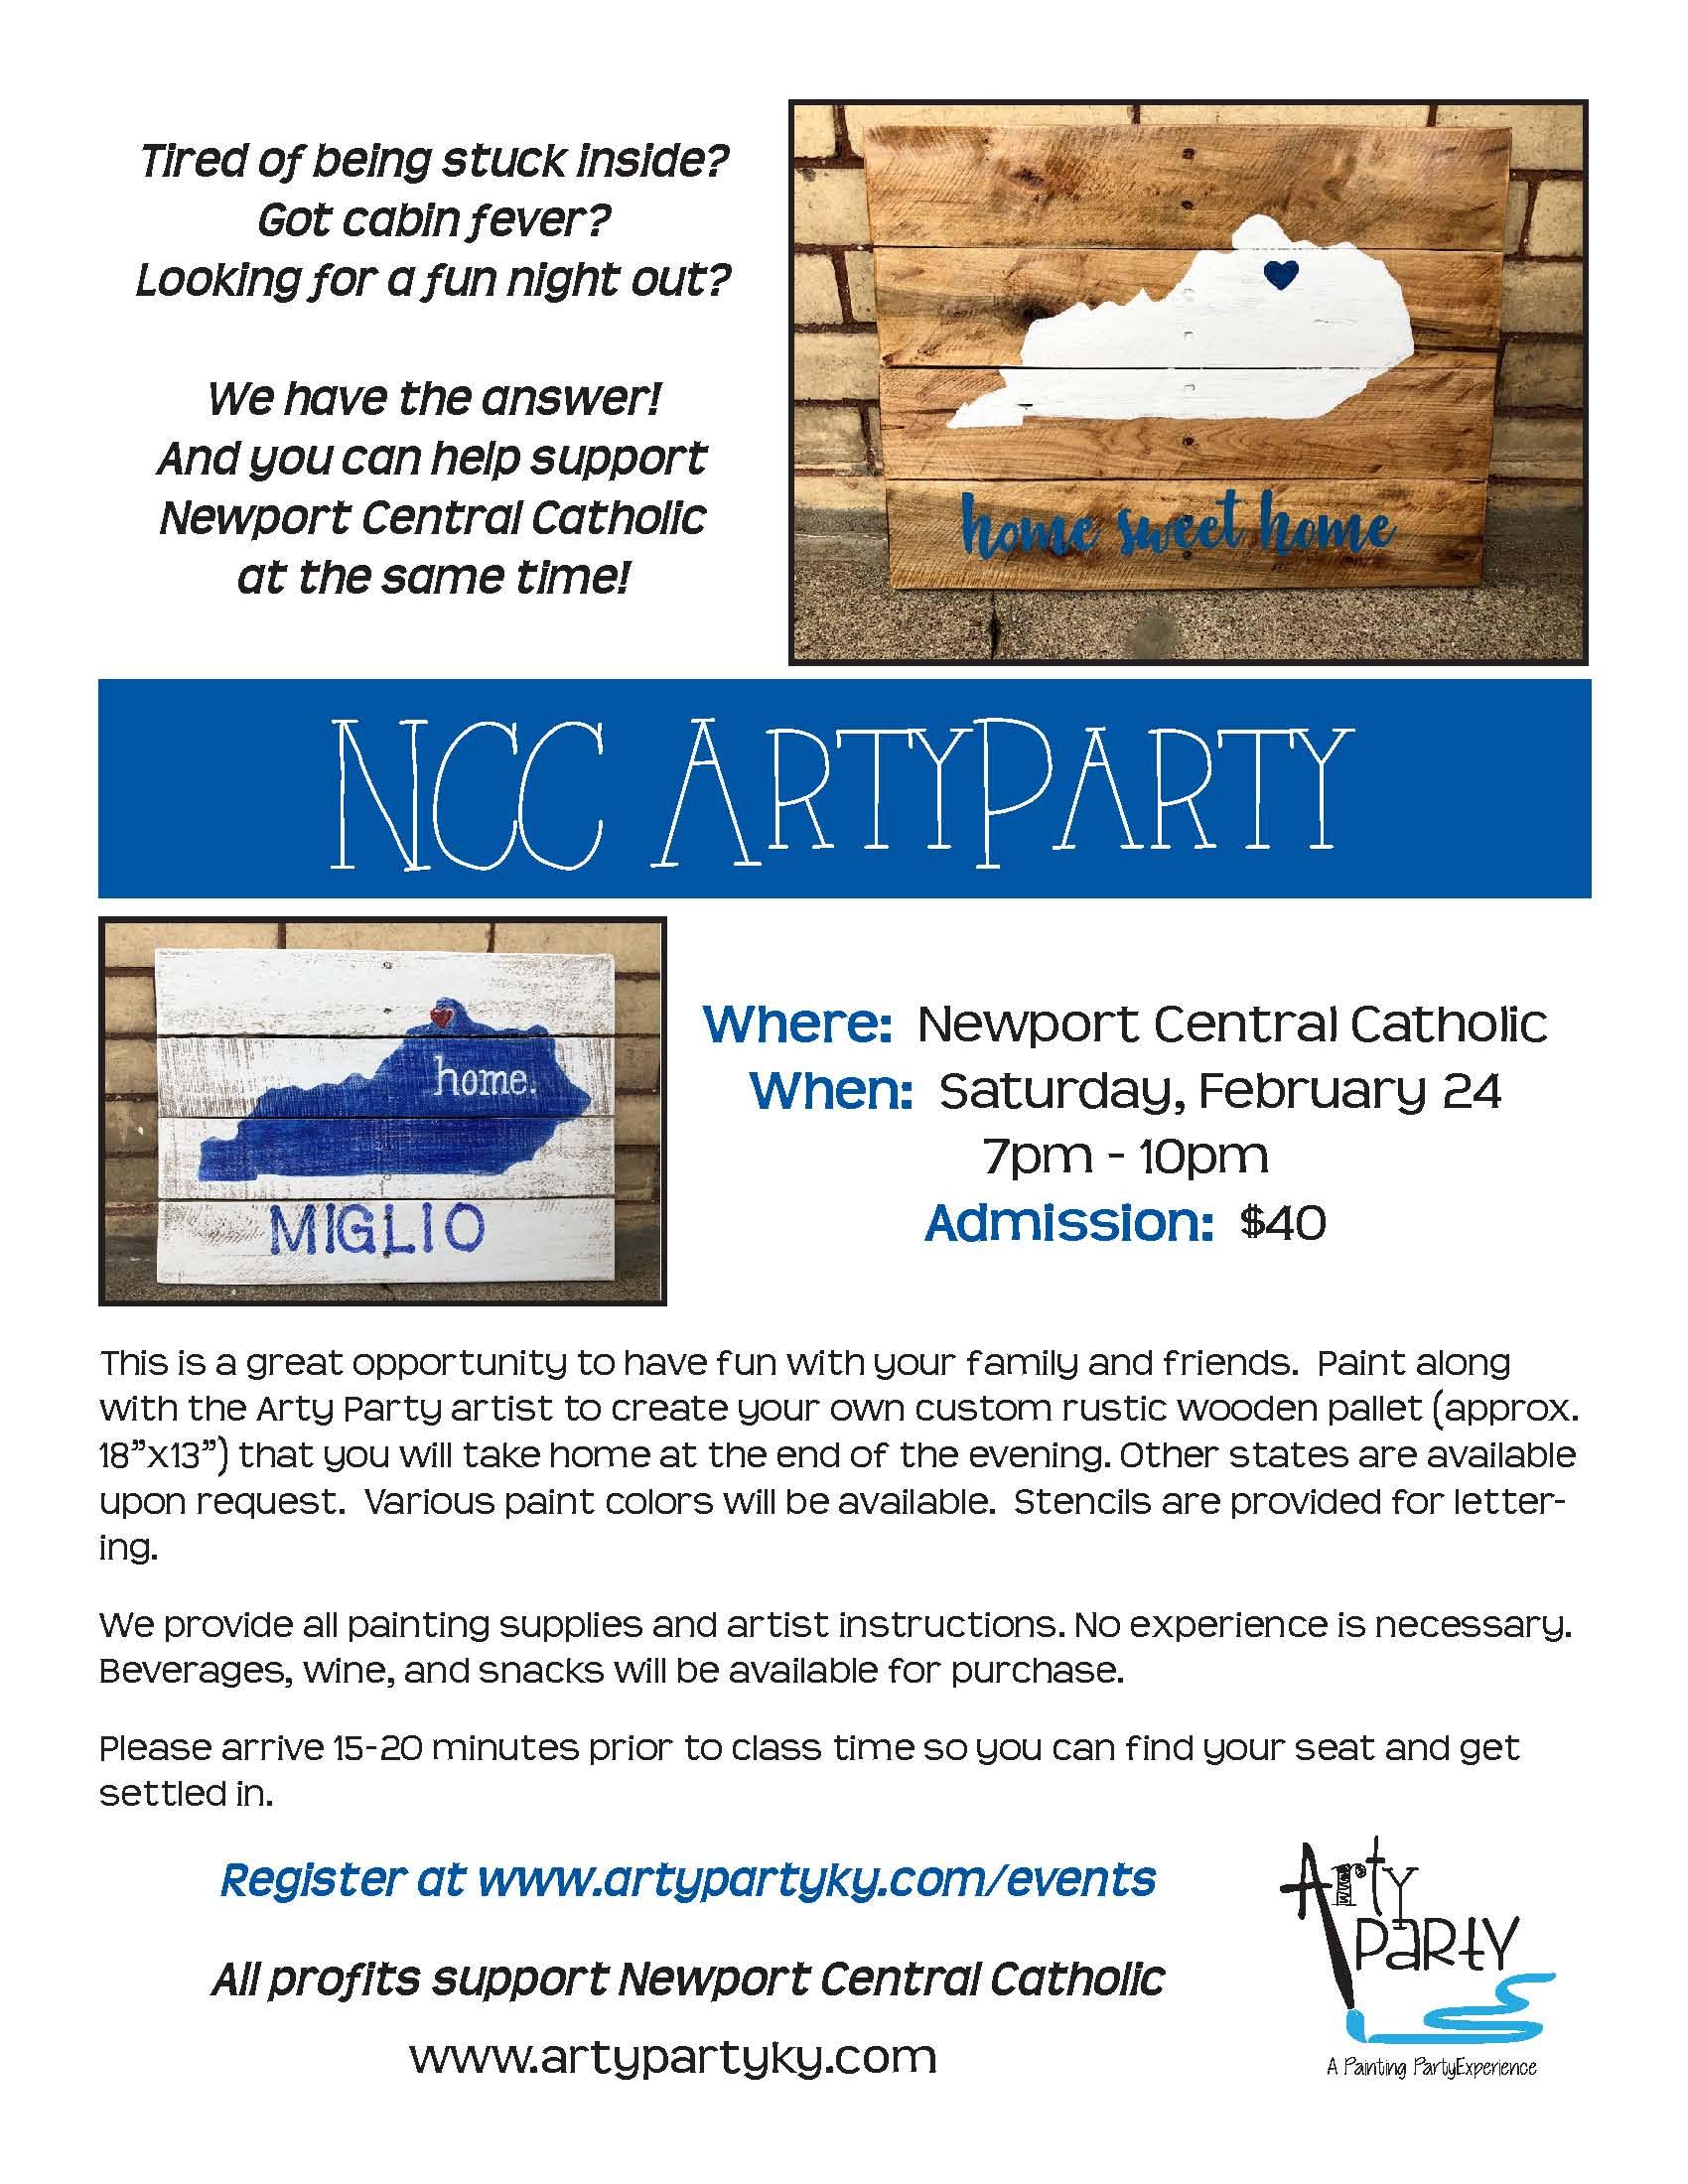 NCC arty party.jpg